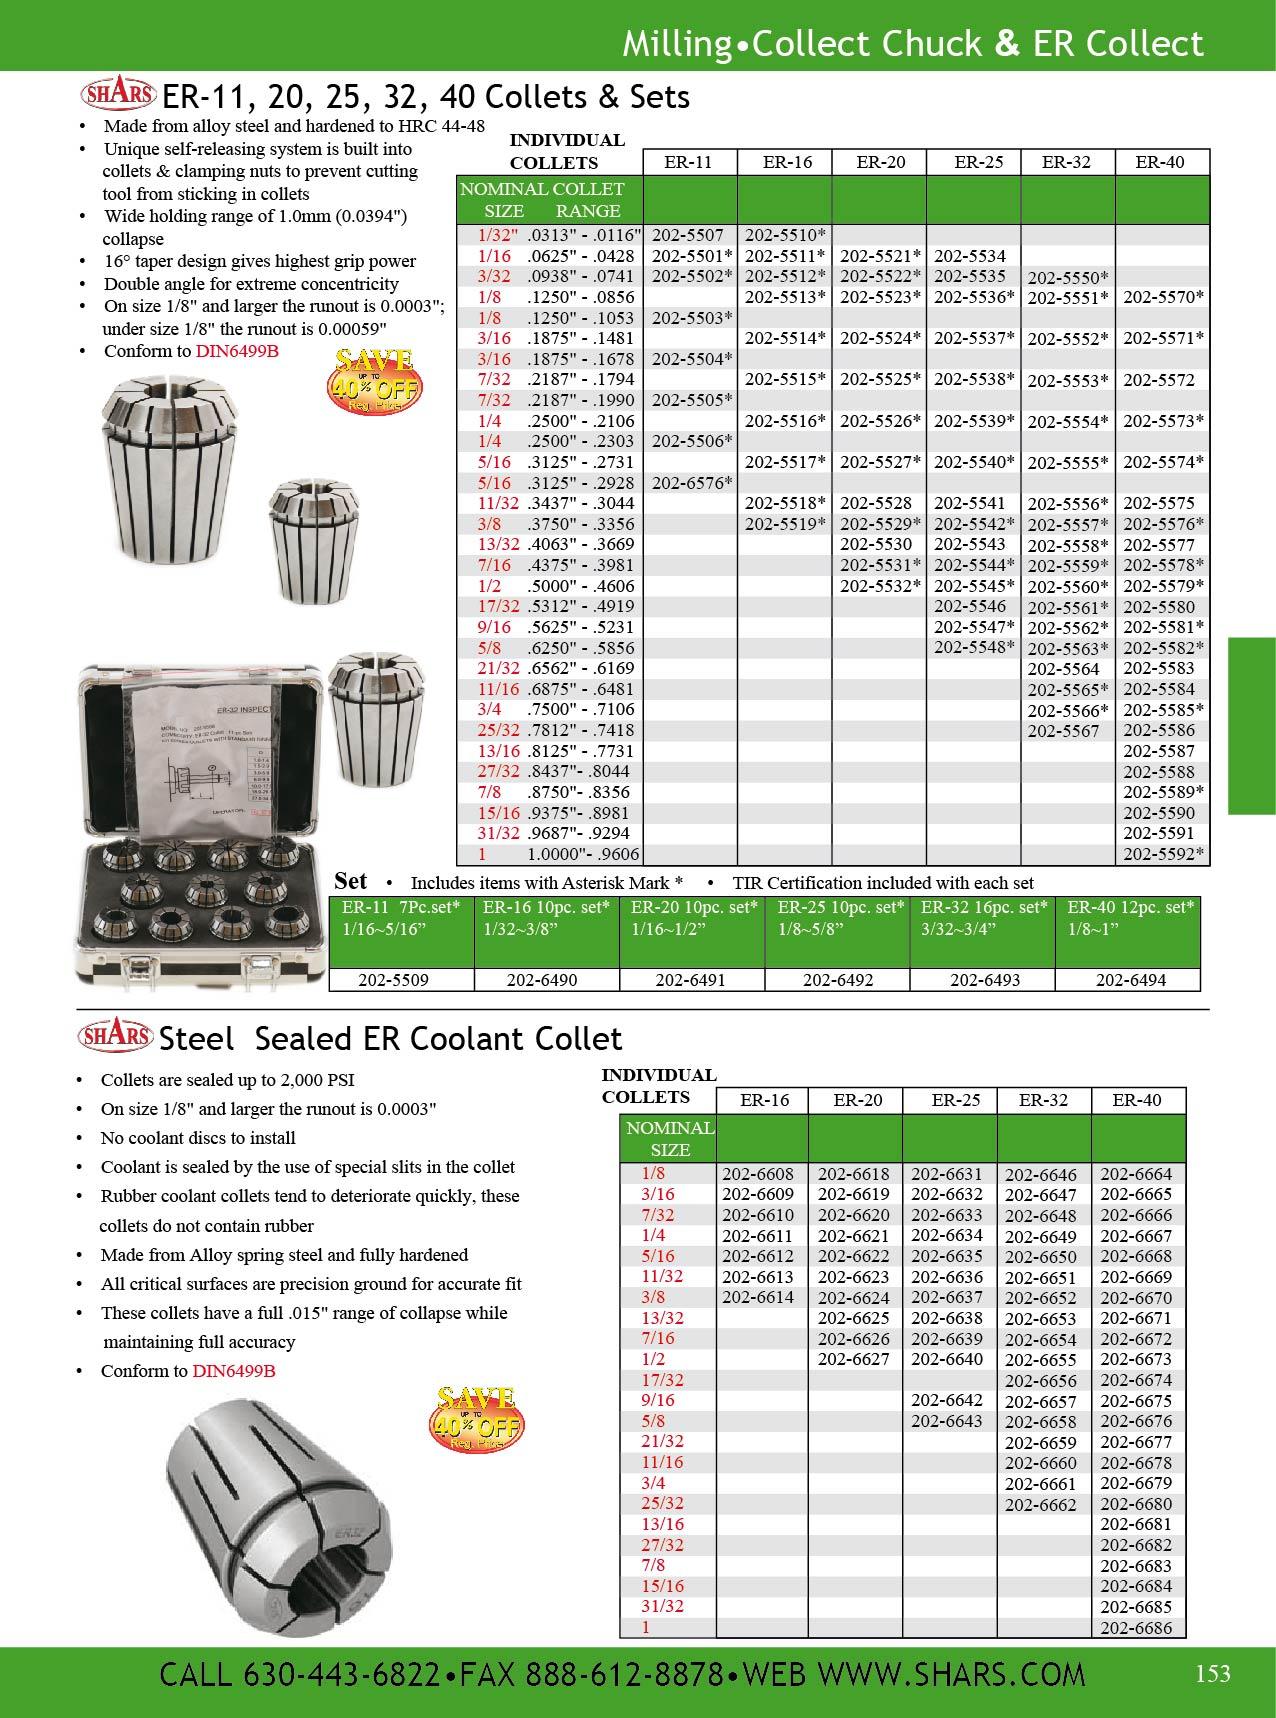 "SHARS CNC Precision Ground Collets ER-40 3//4/"" 18-19 mm DIN 6499//B New"